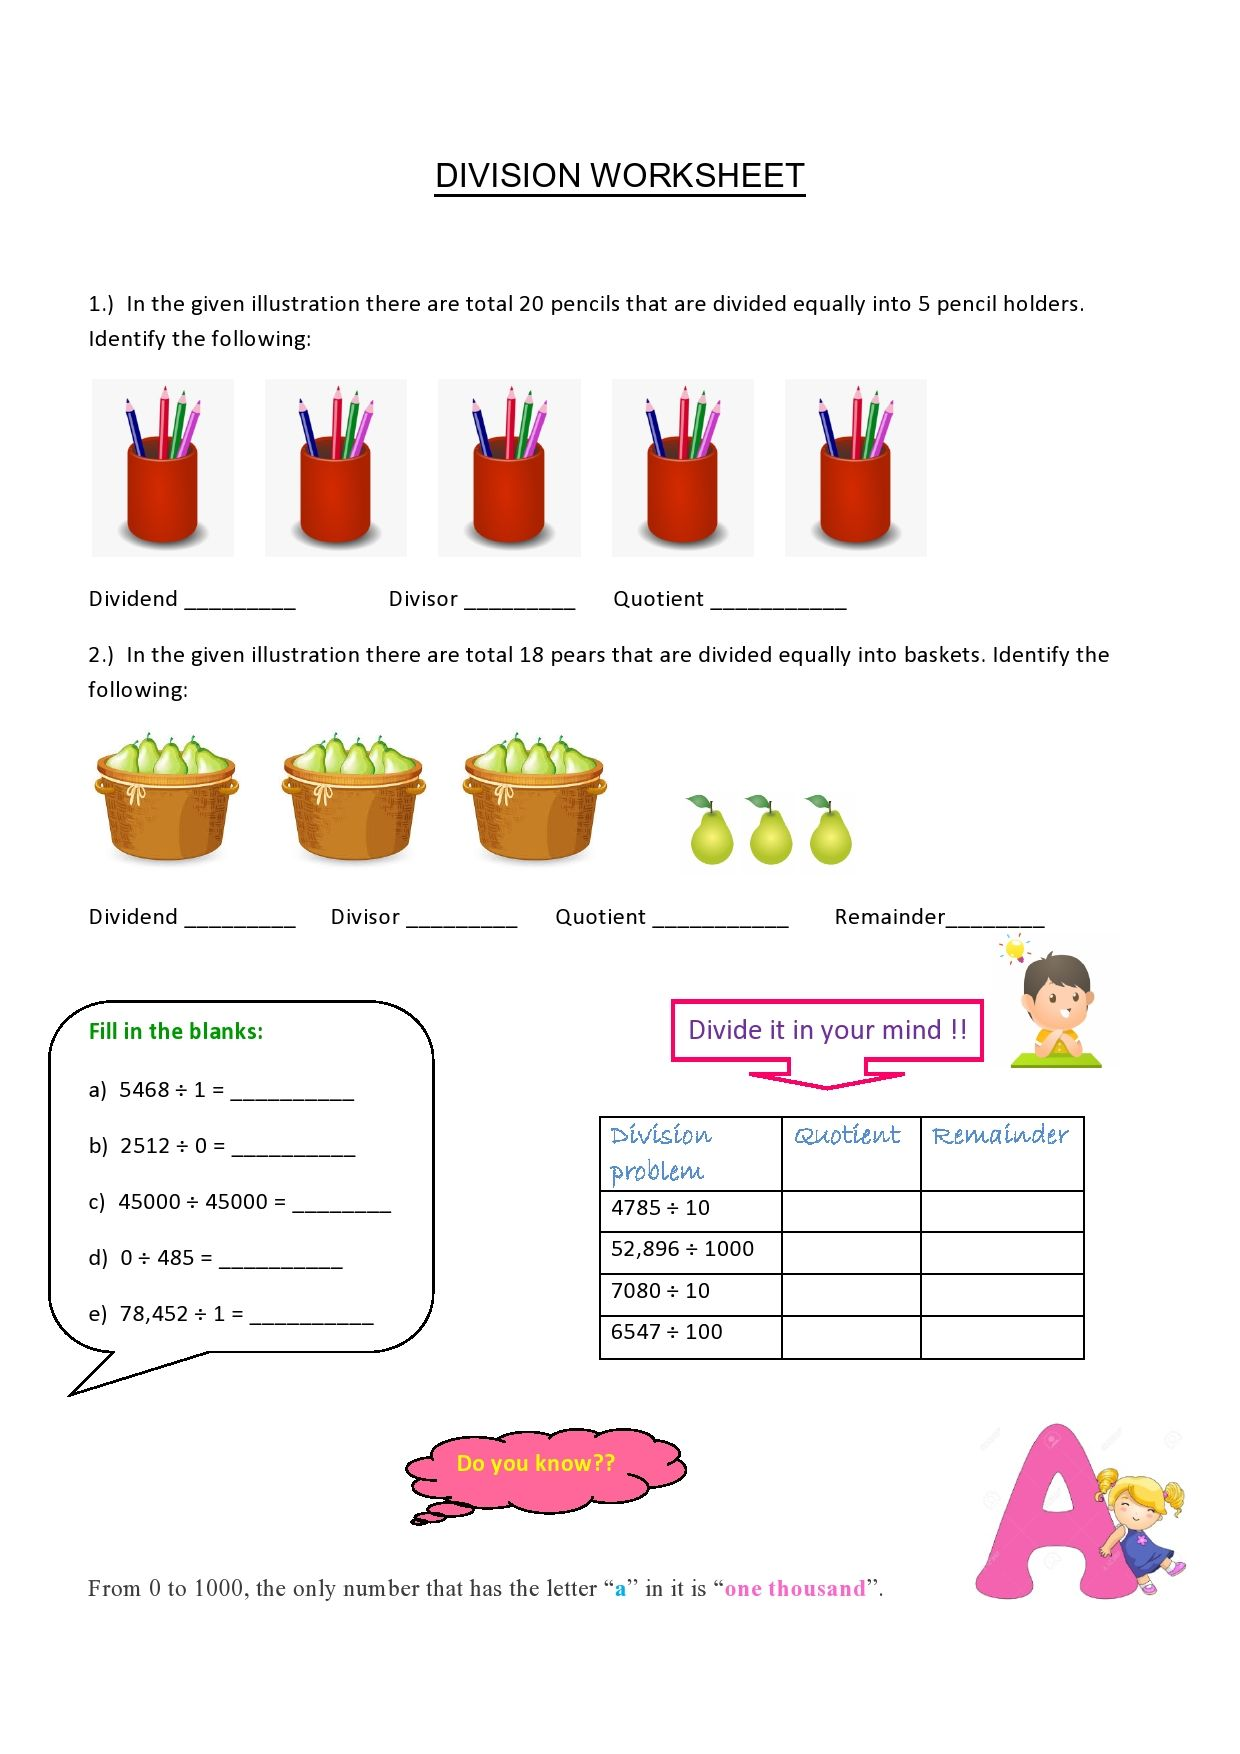 Division Worksheet In